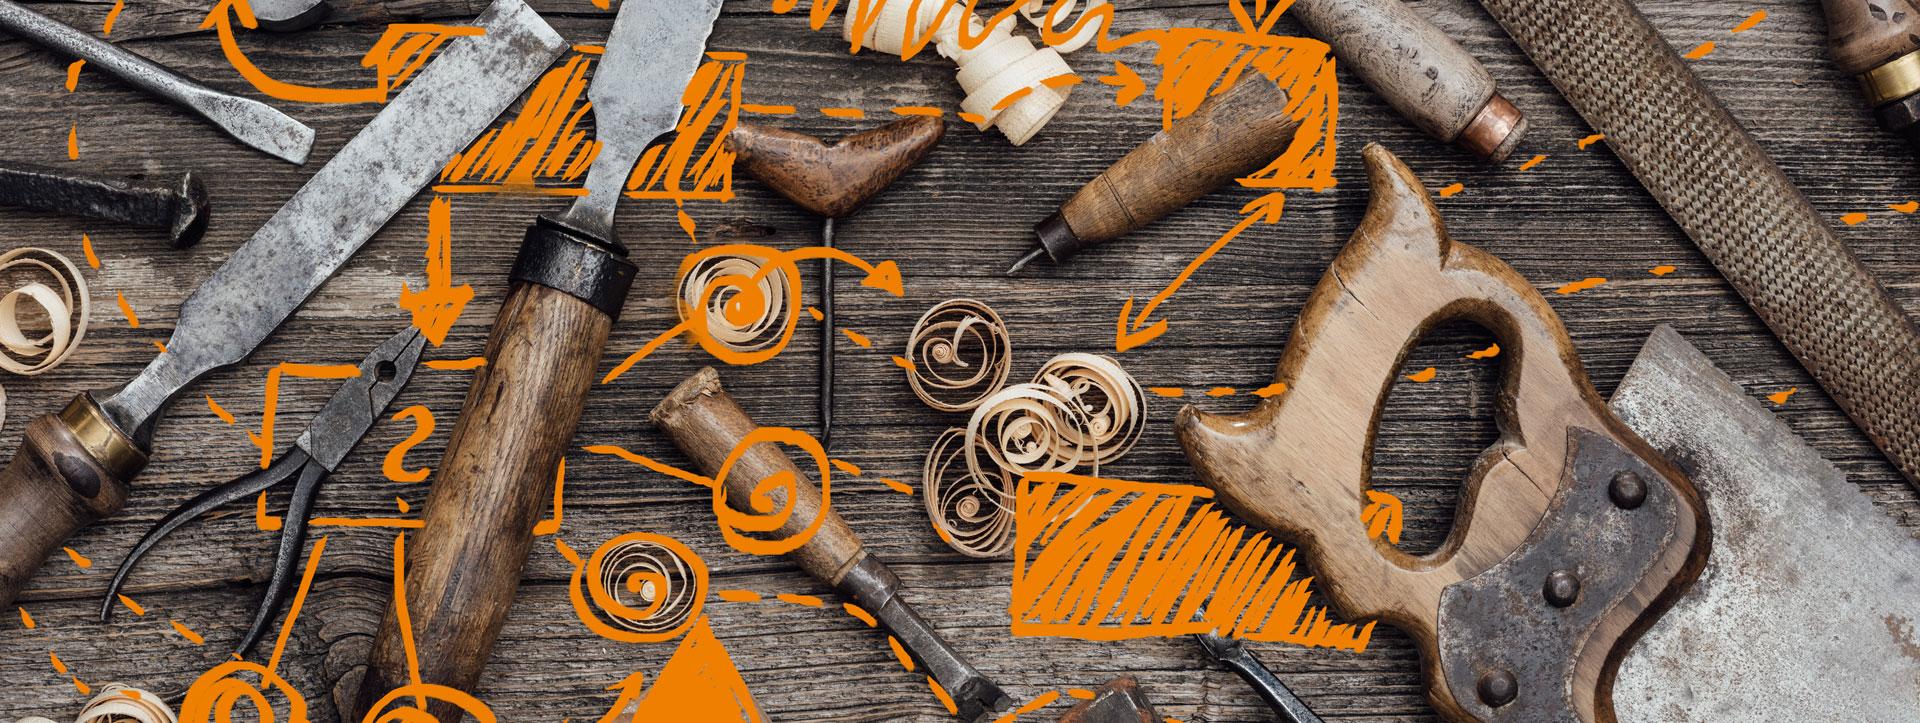 SOCIUS Seminar: OE Werkzeuge Mai